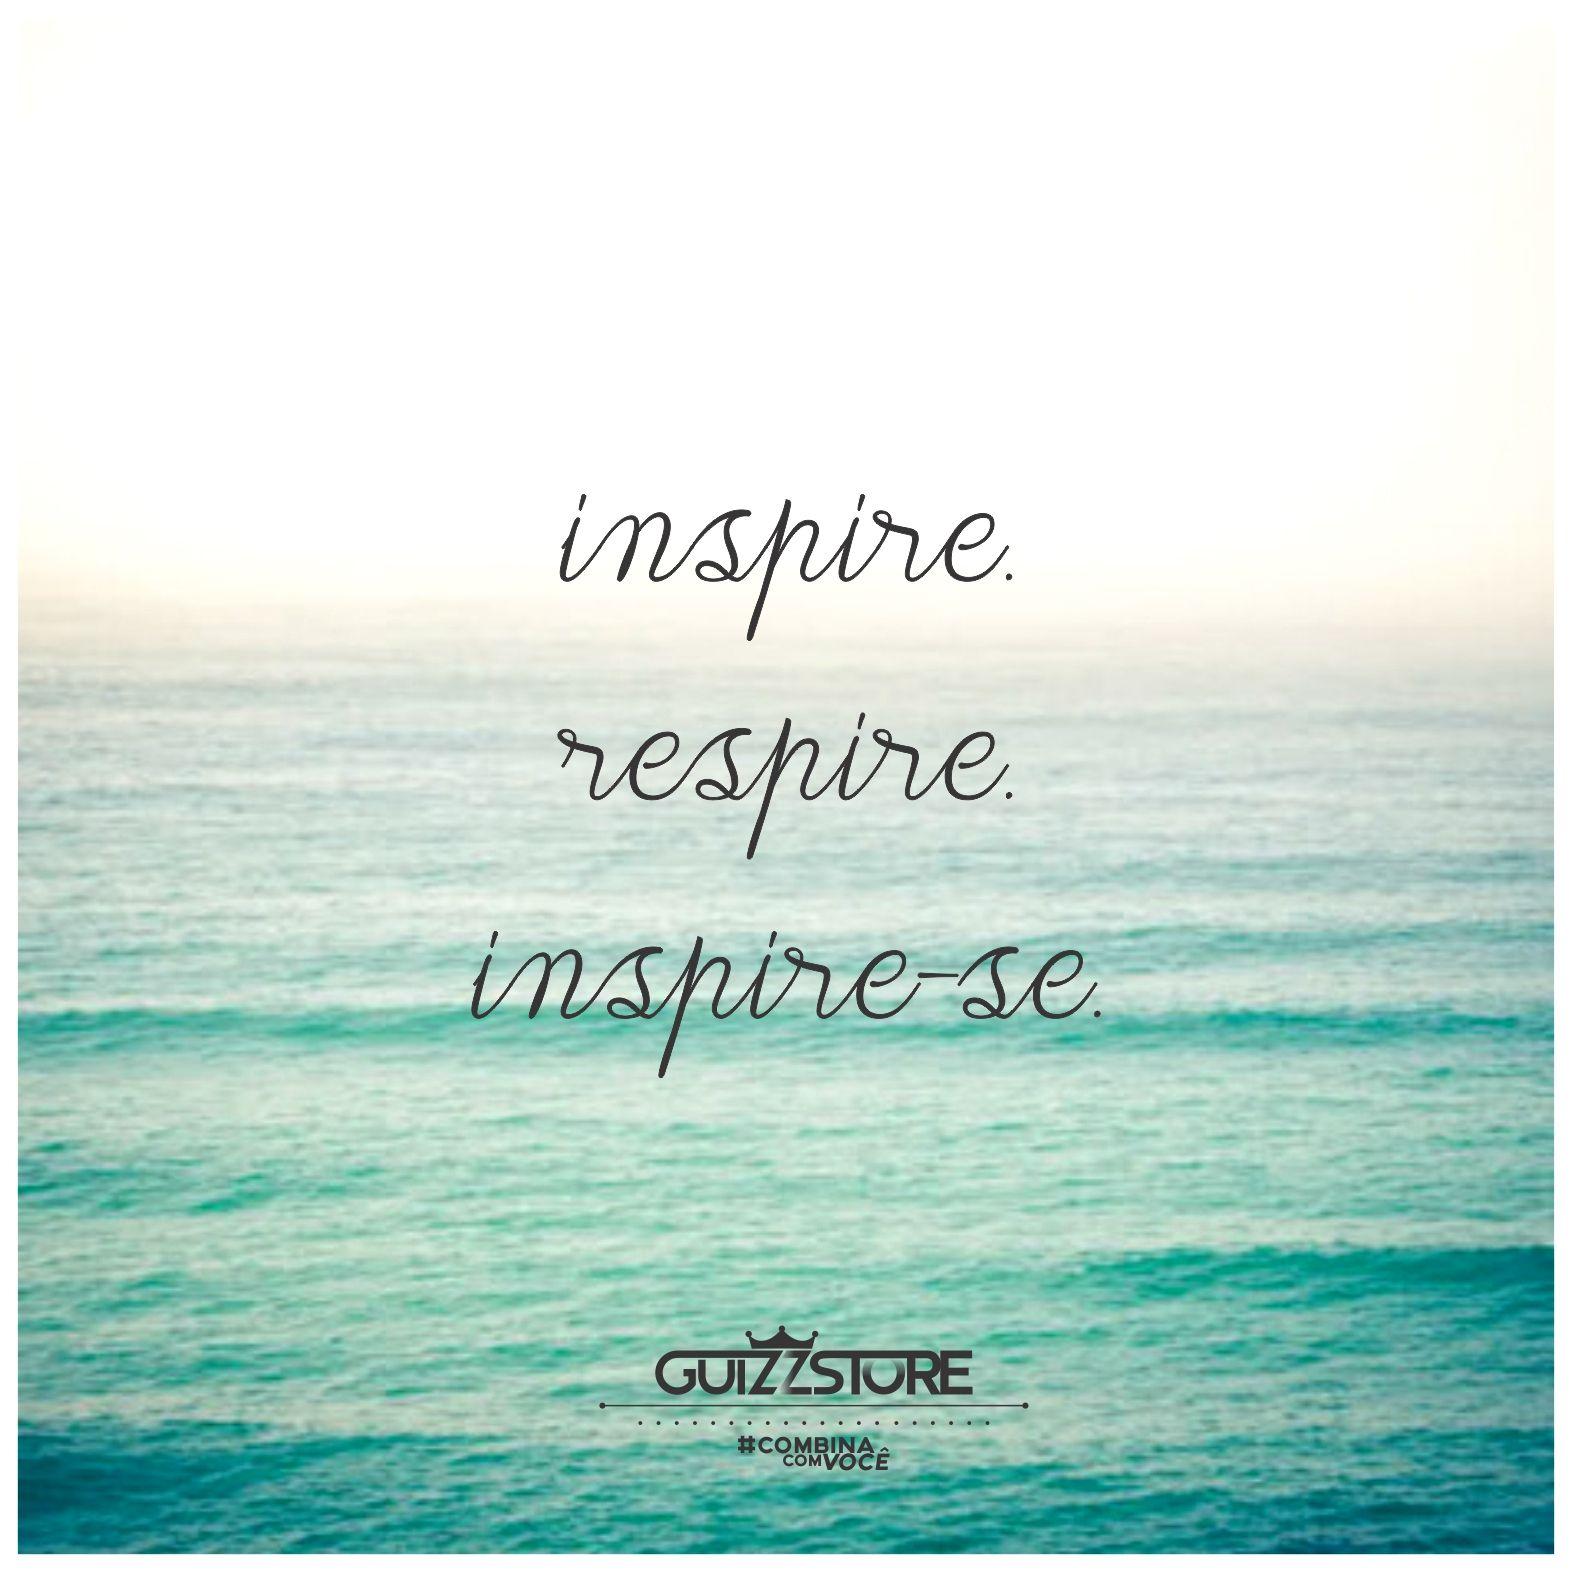 Inspire-se!